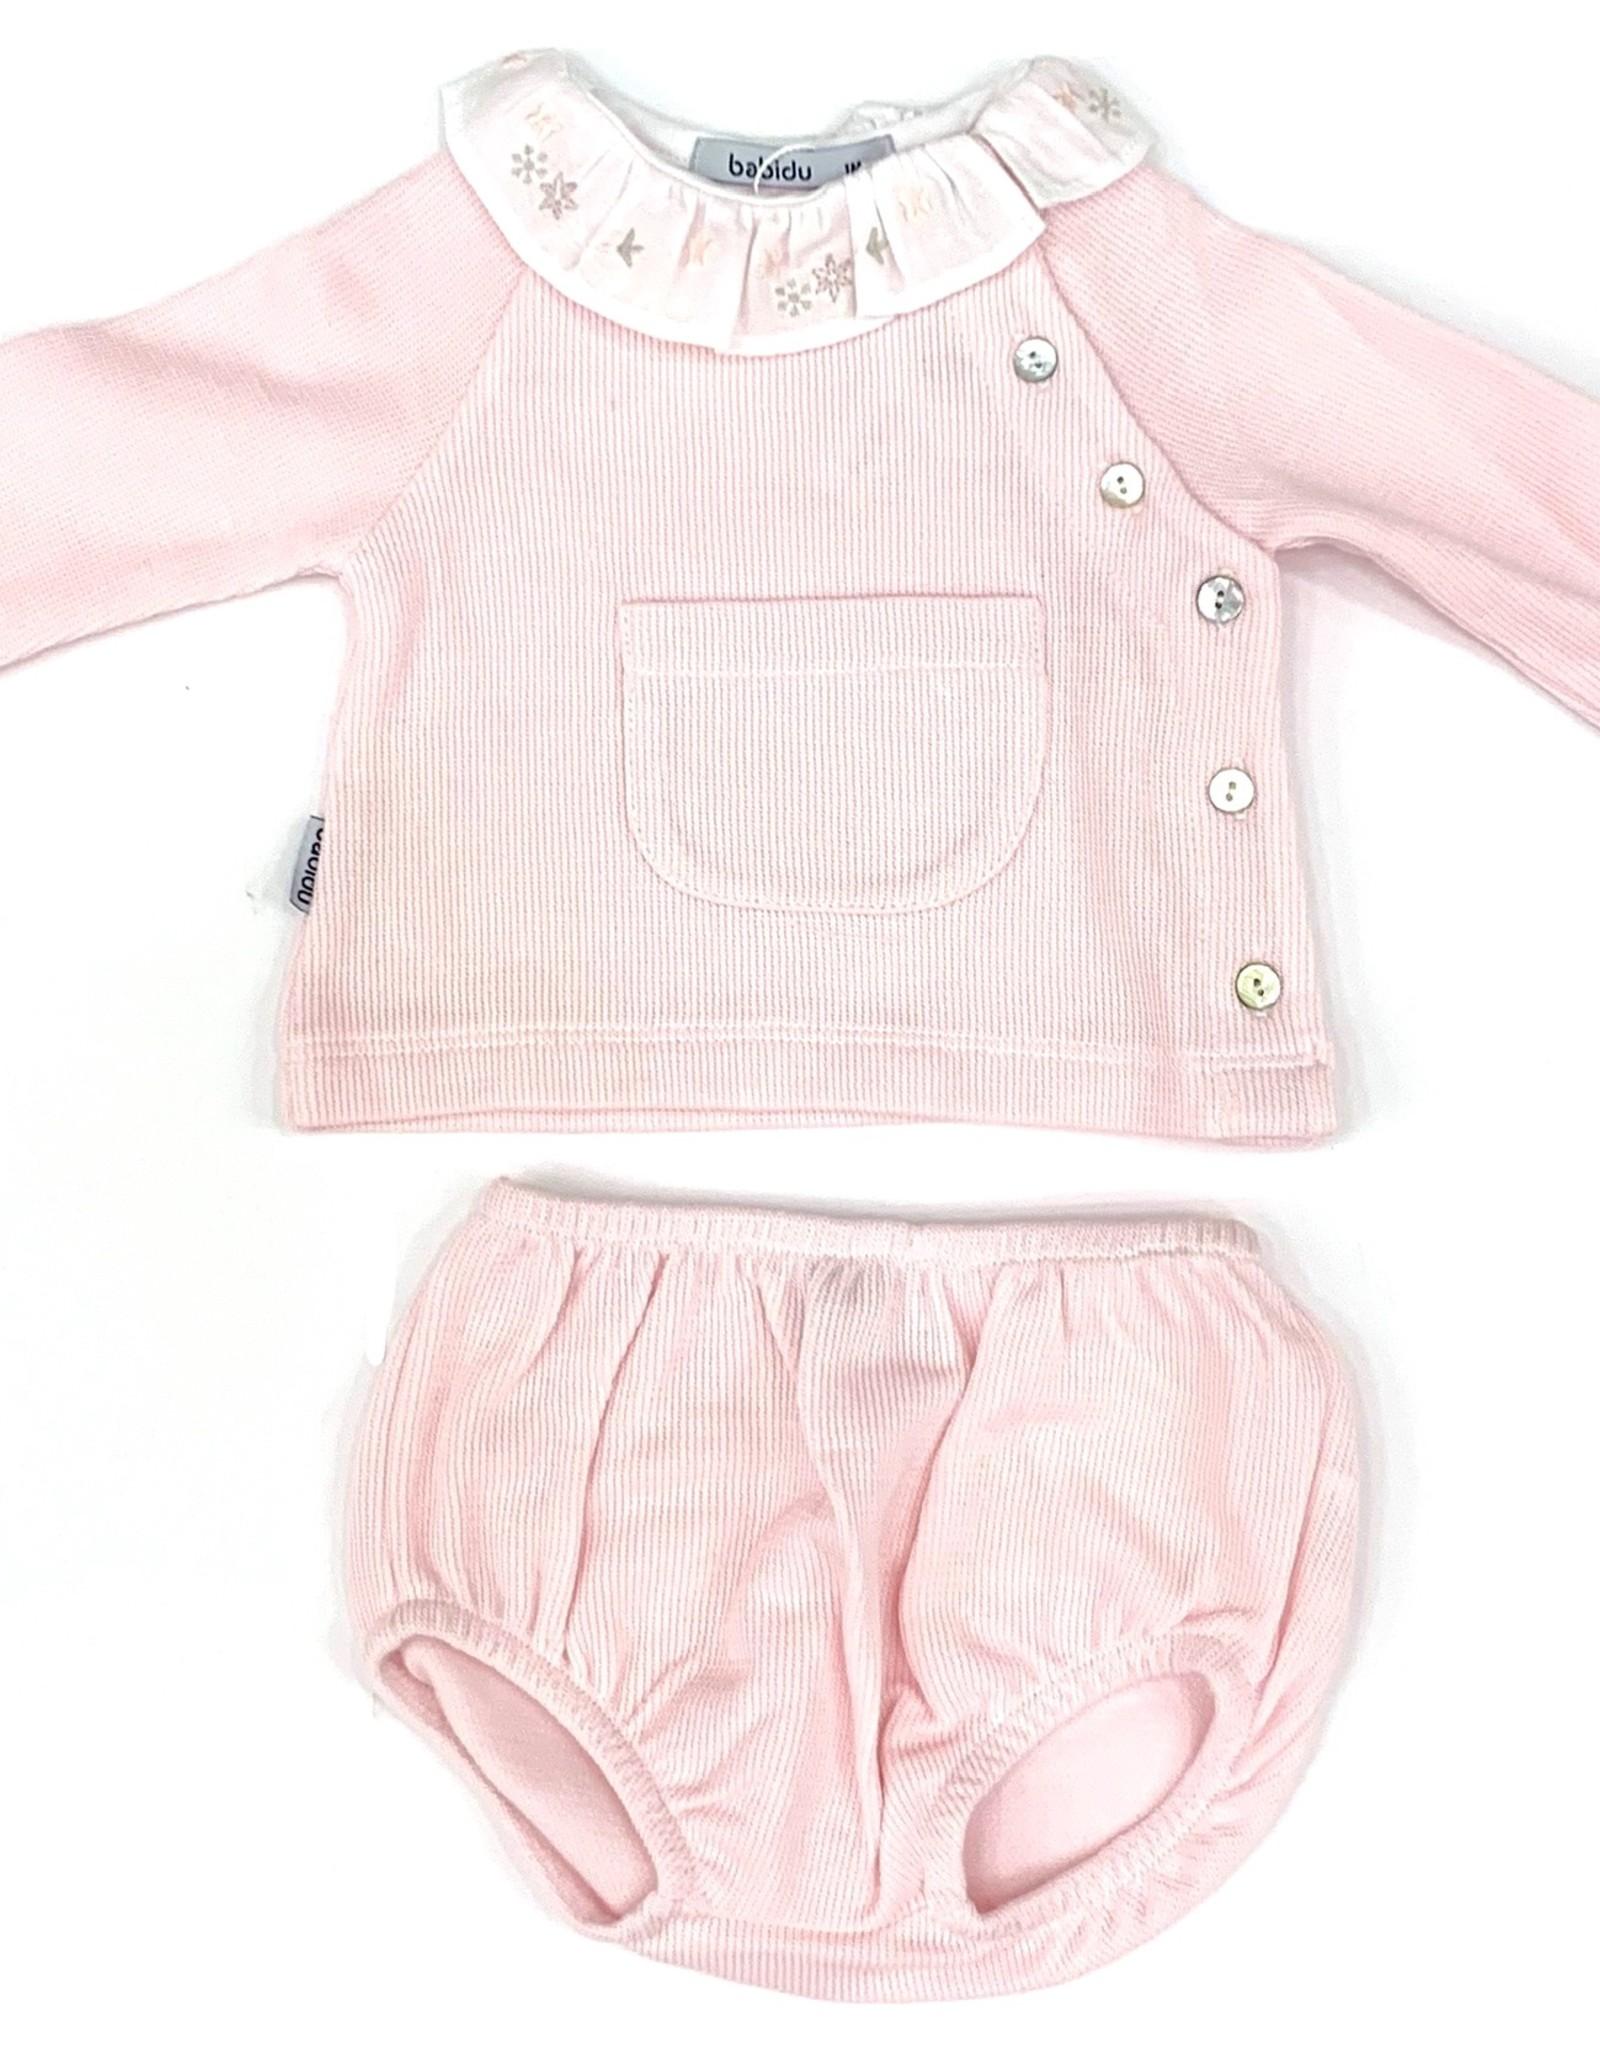 Babidu Pink Two Piece Short Set With White Collar